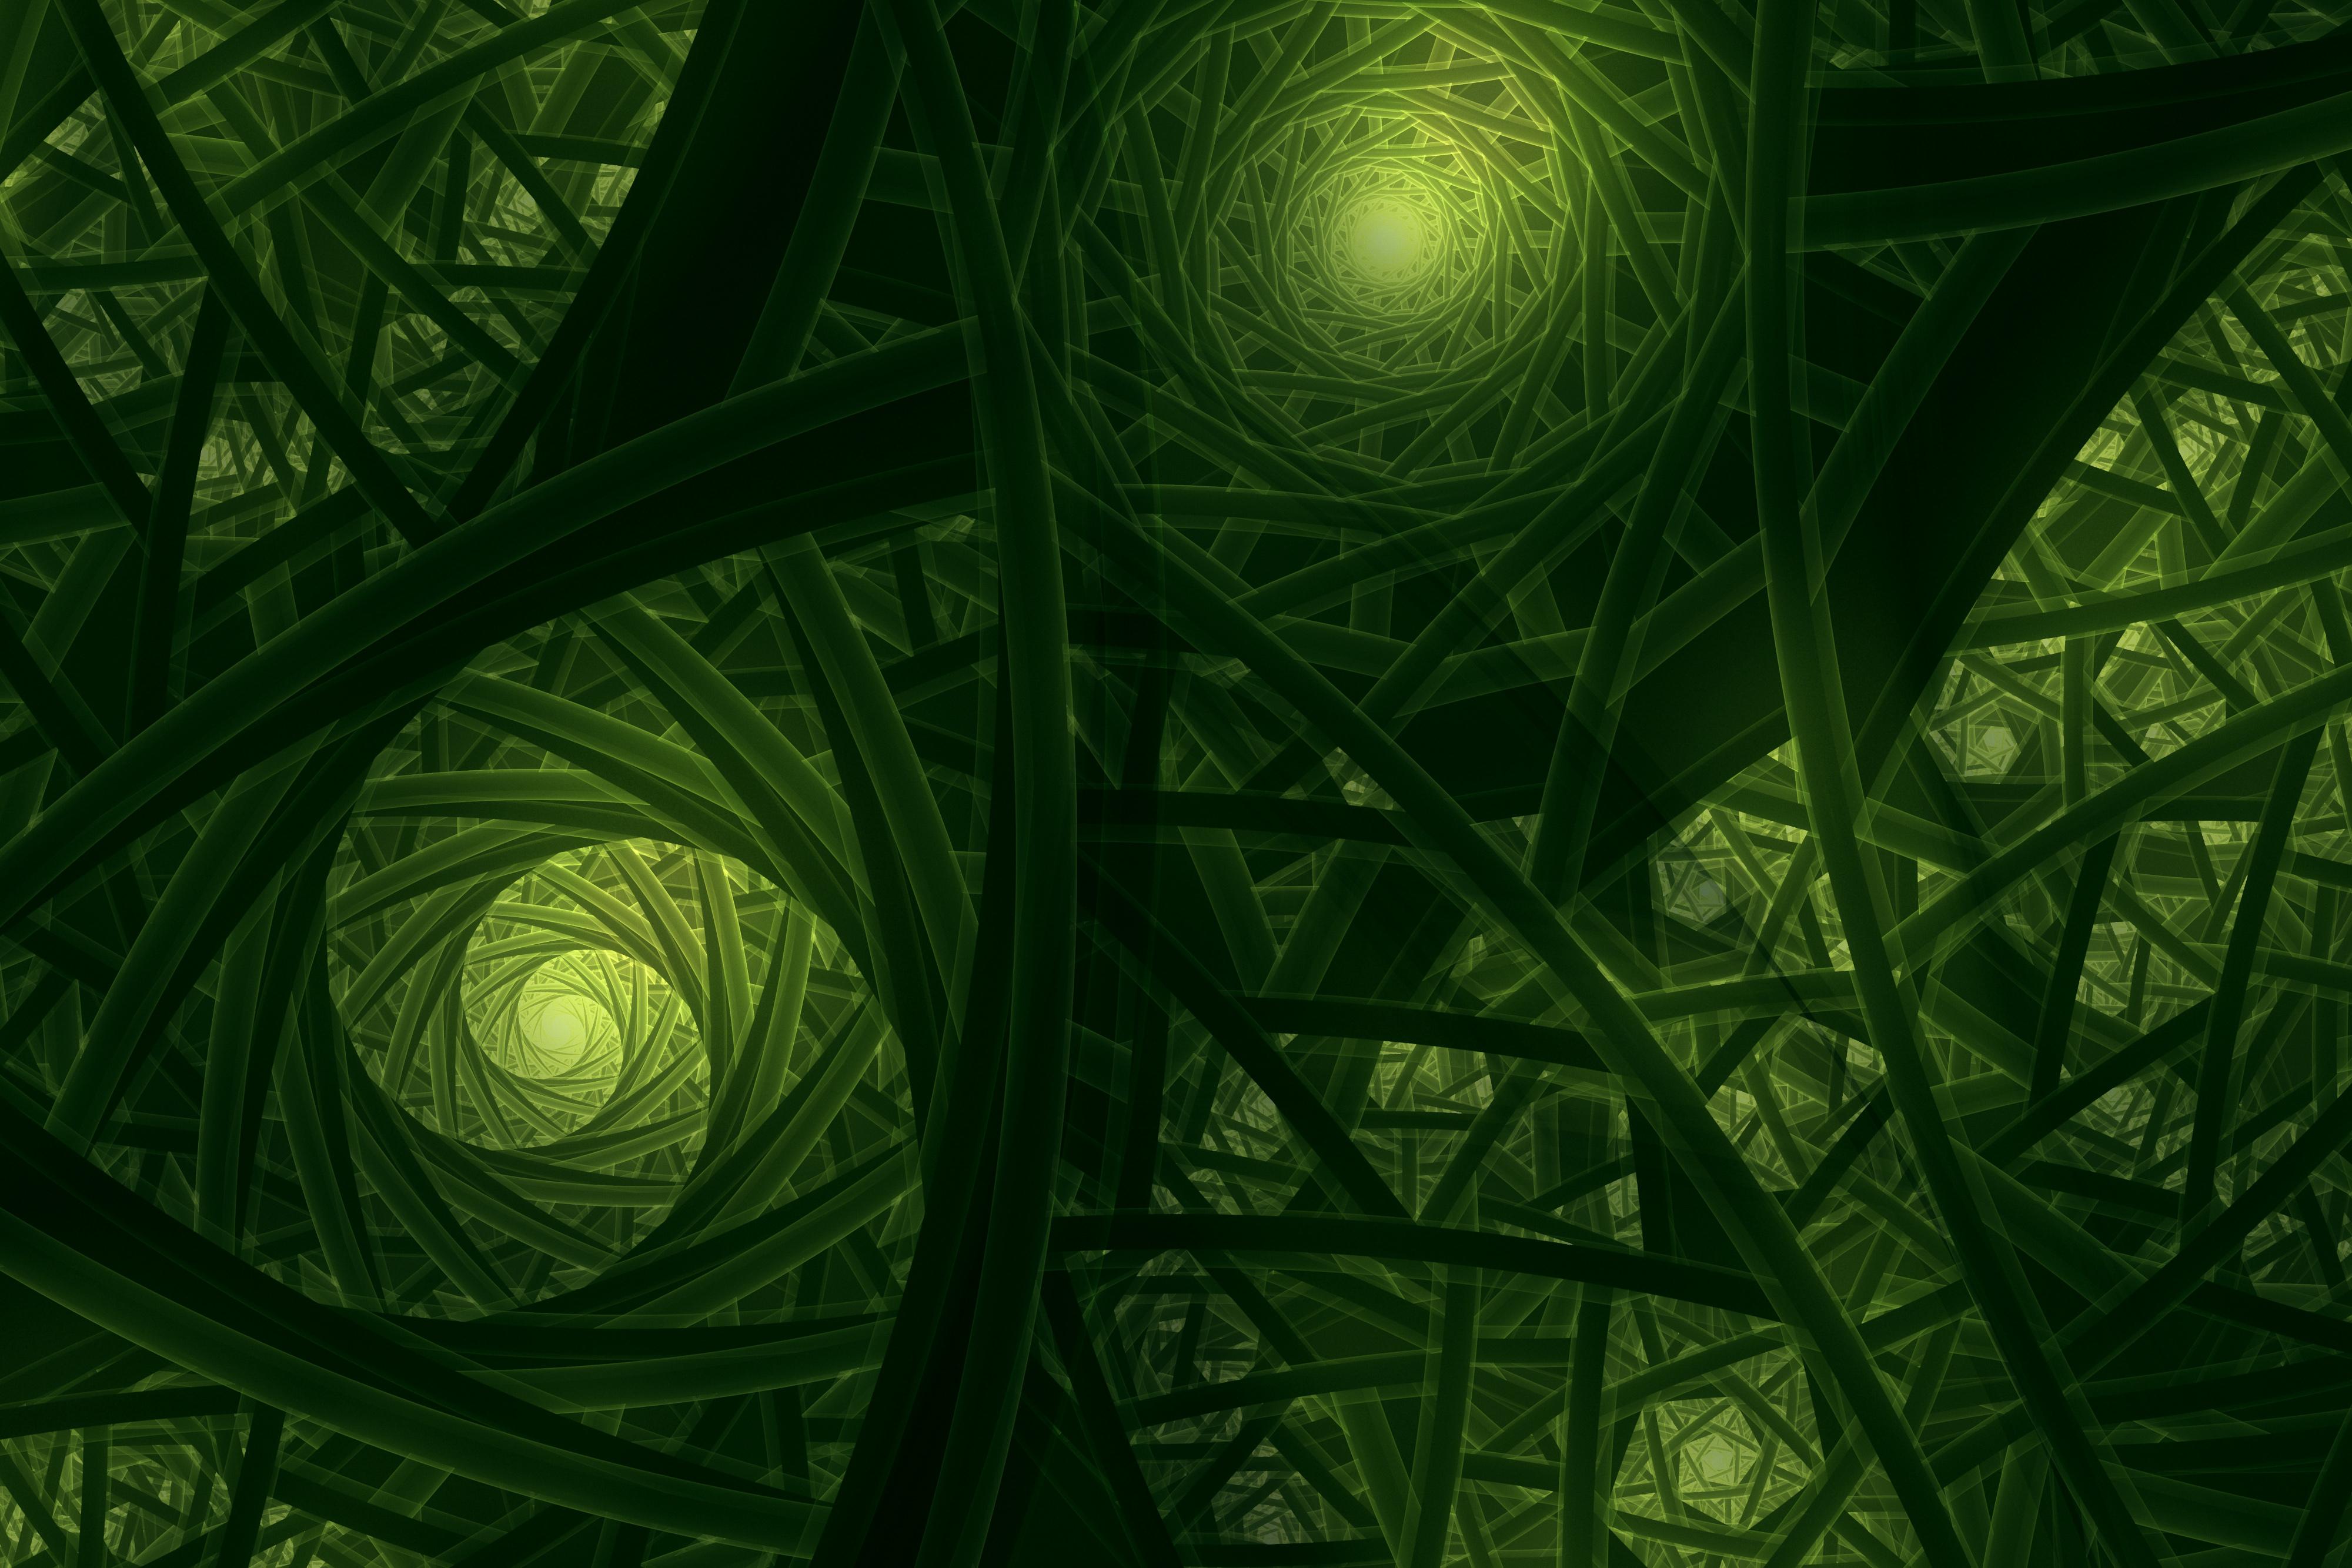 Wallpaper Fractals, Green, 4K, Abstract, #7419